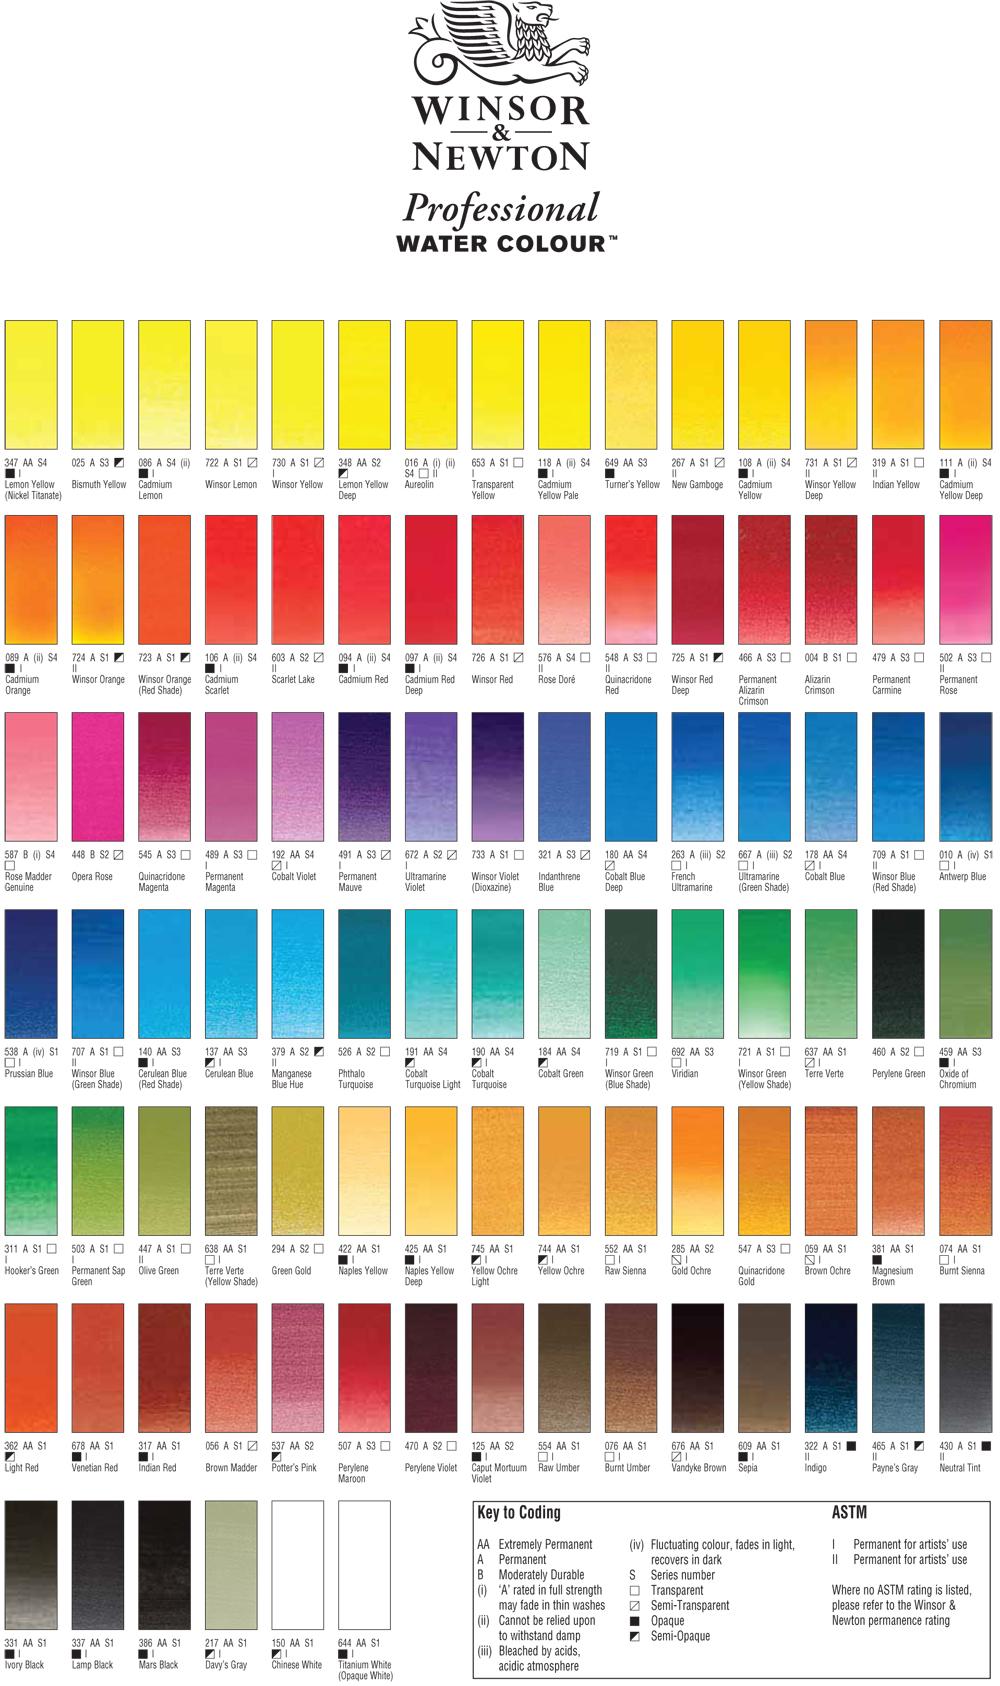 winsor newton professional water colour colour chart